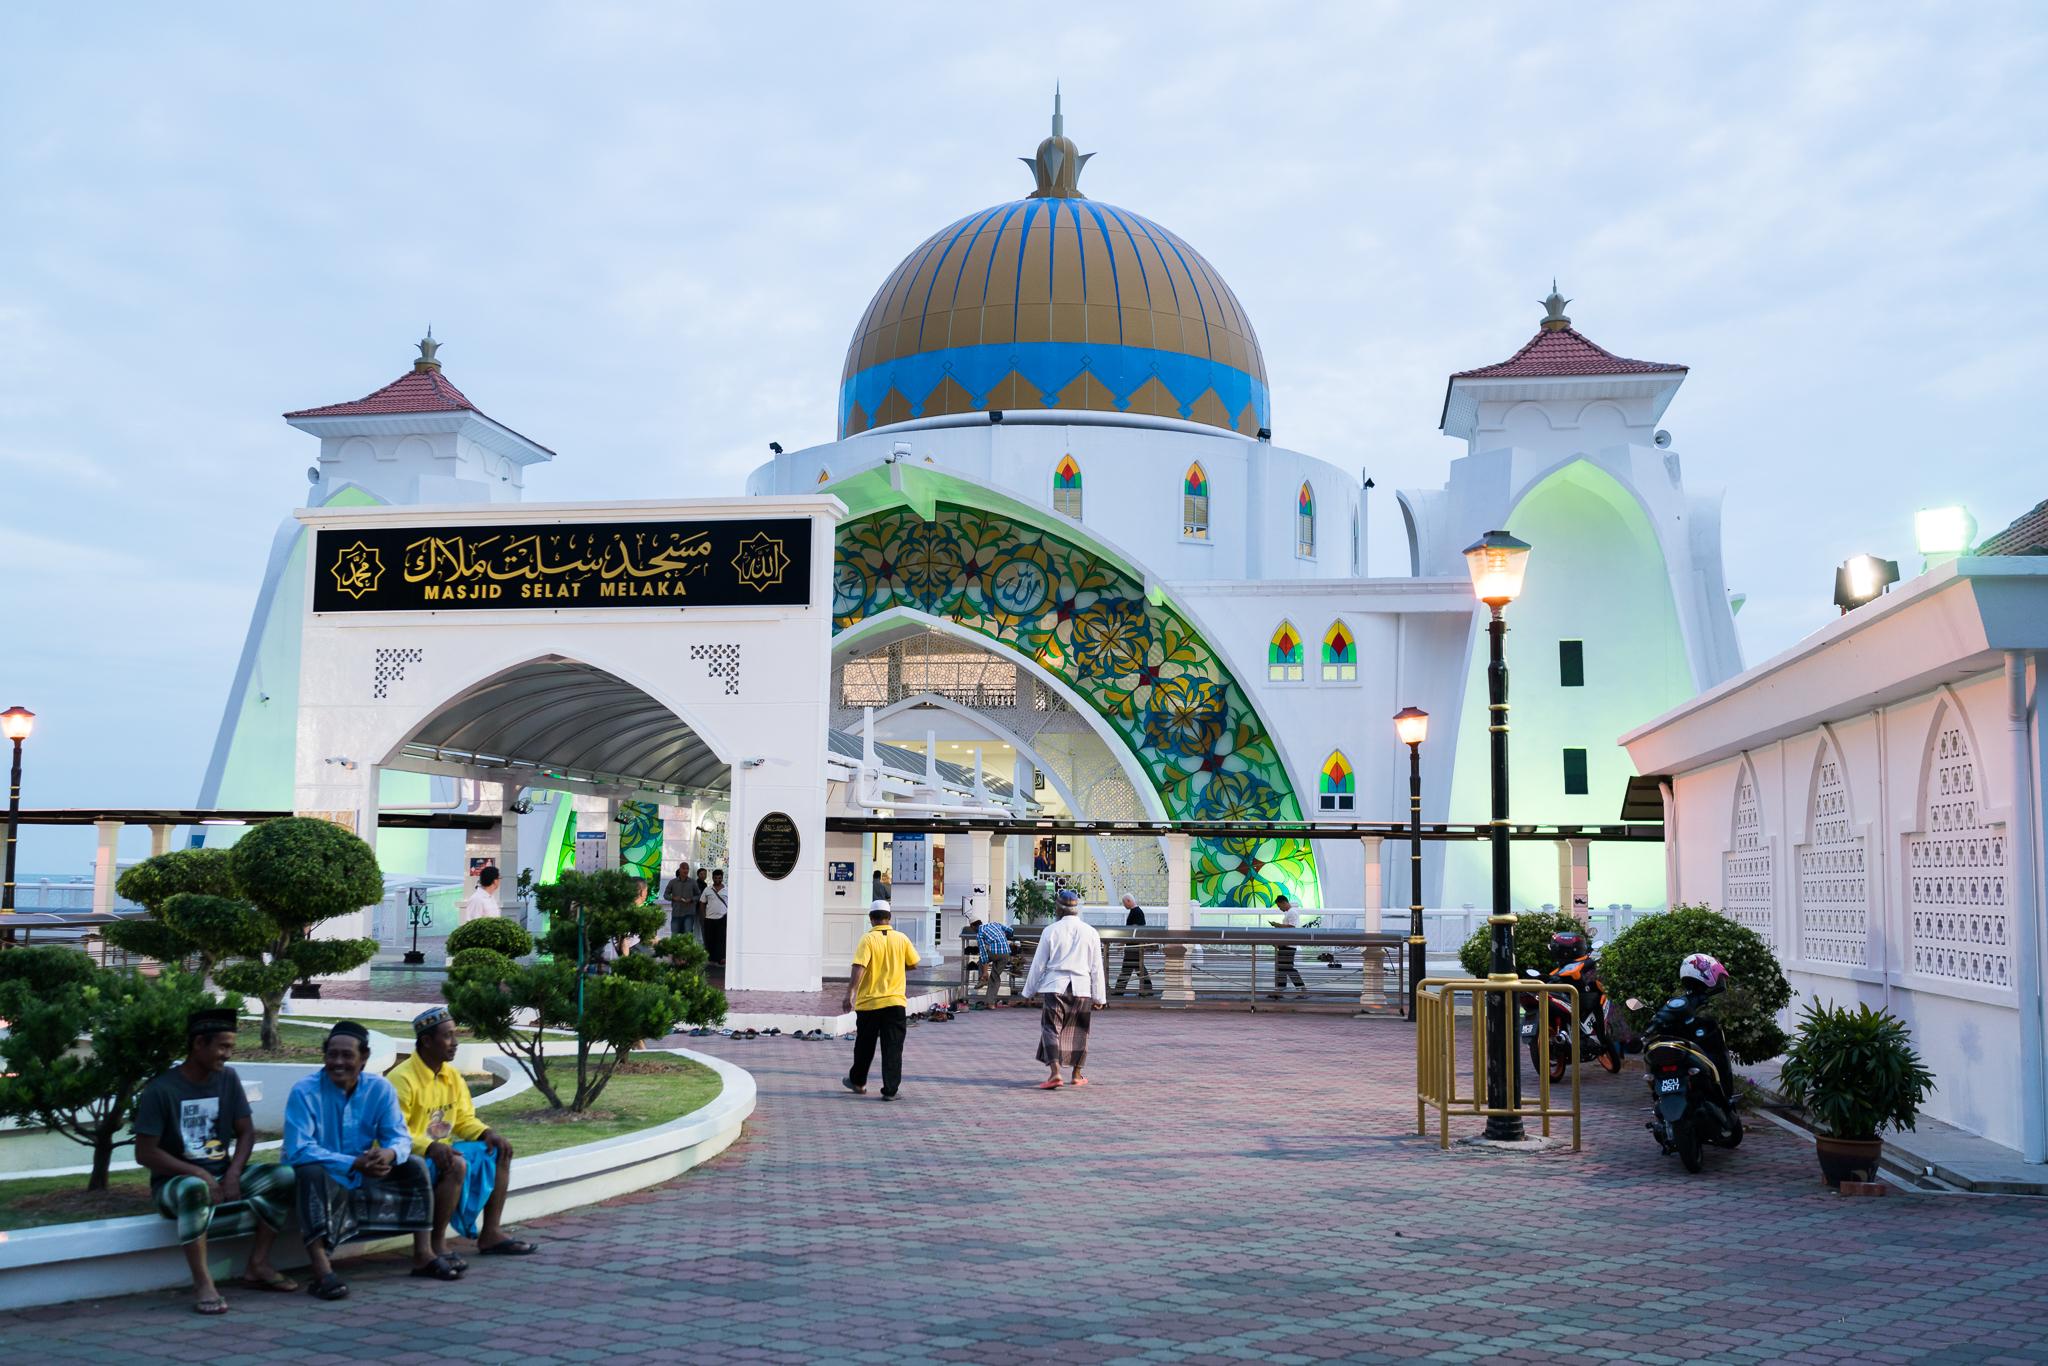 The floating mosque in Melaka